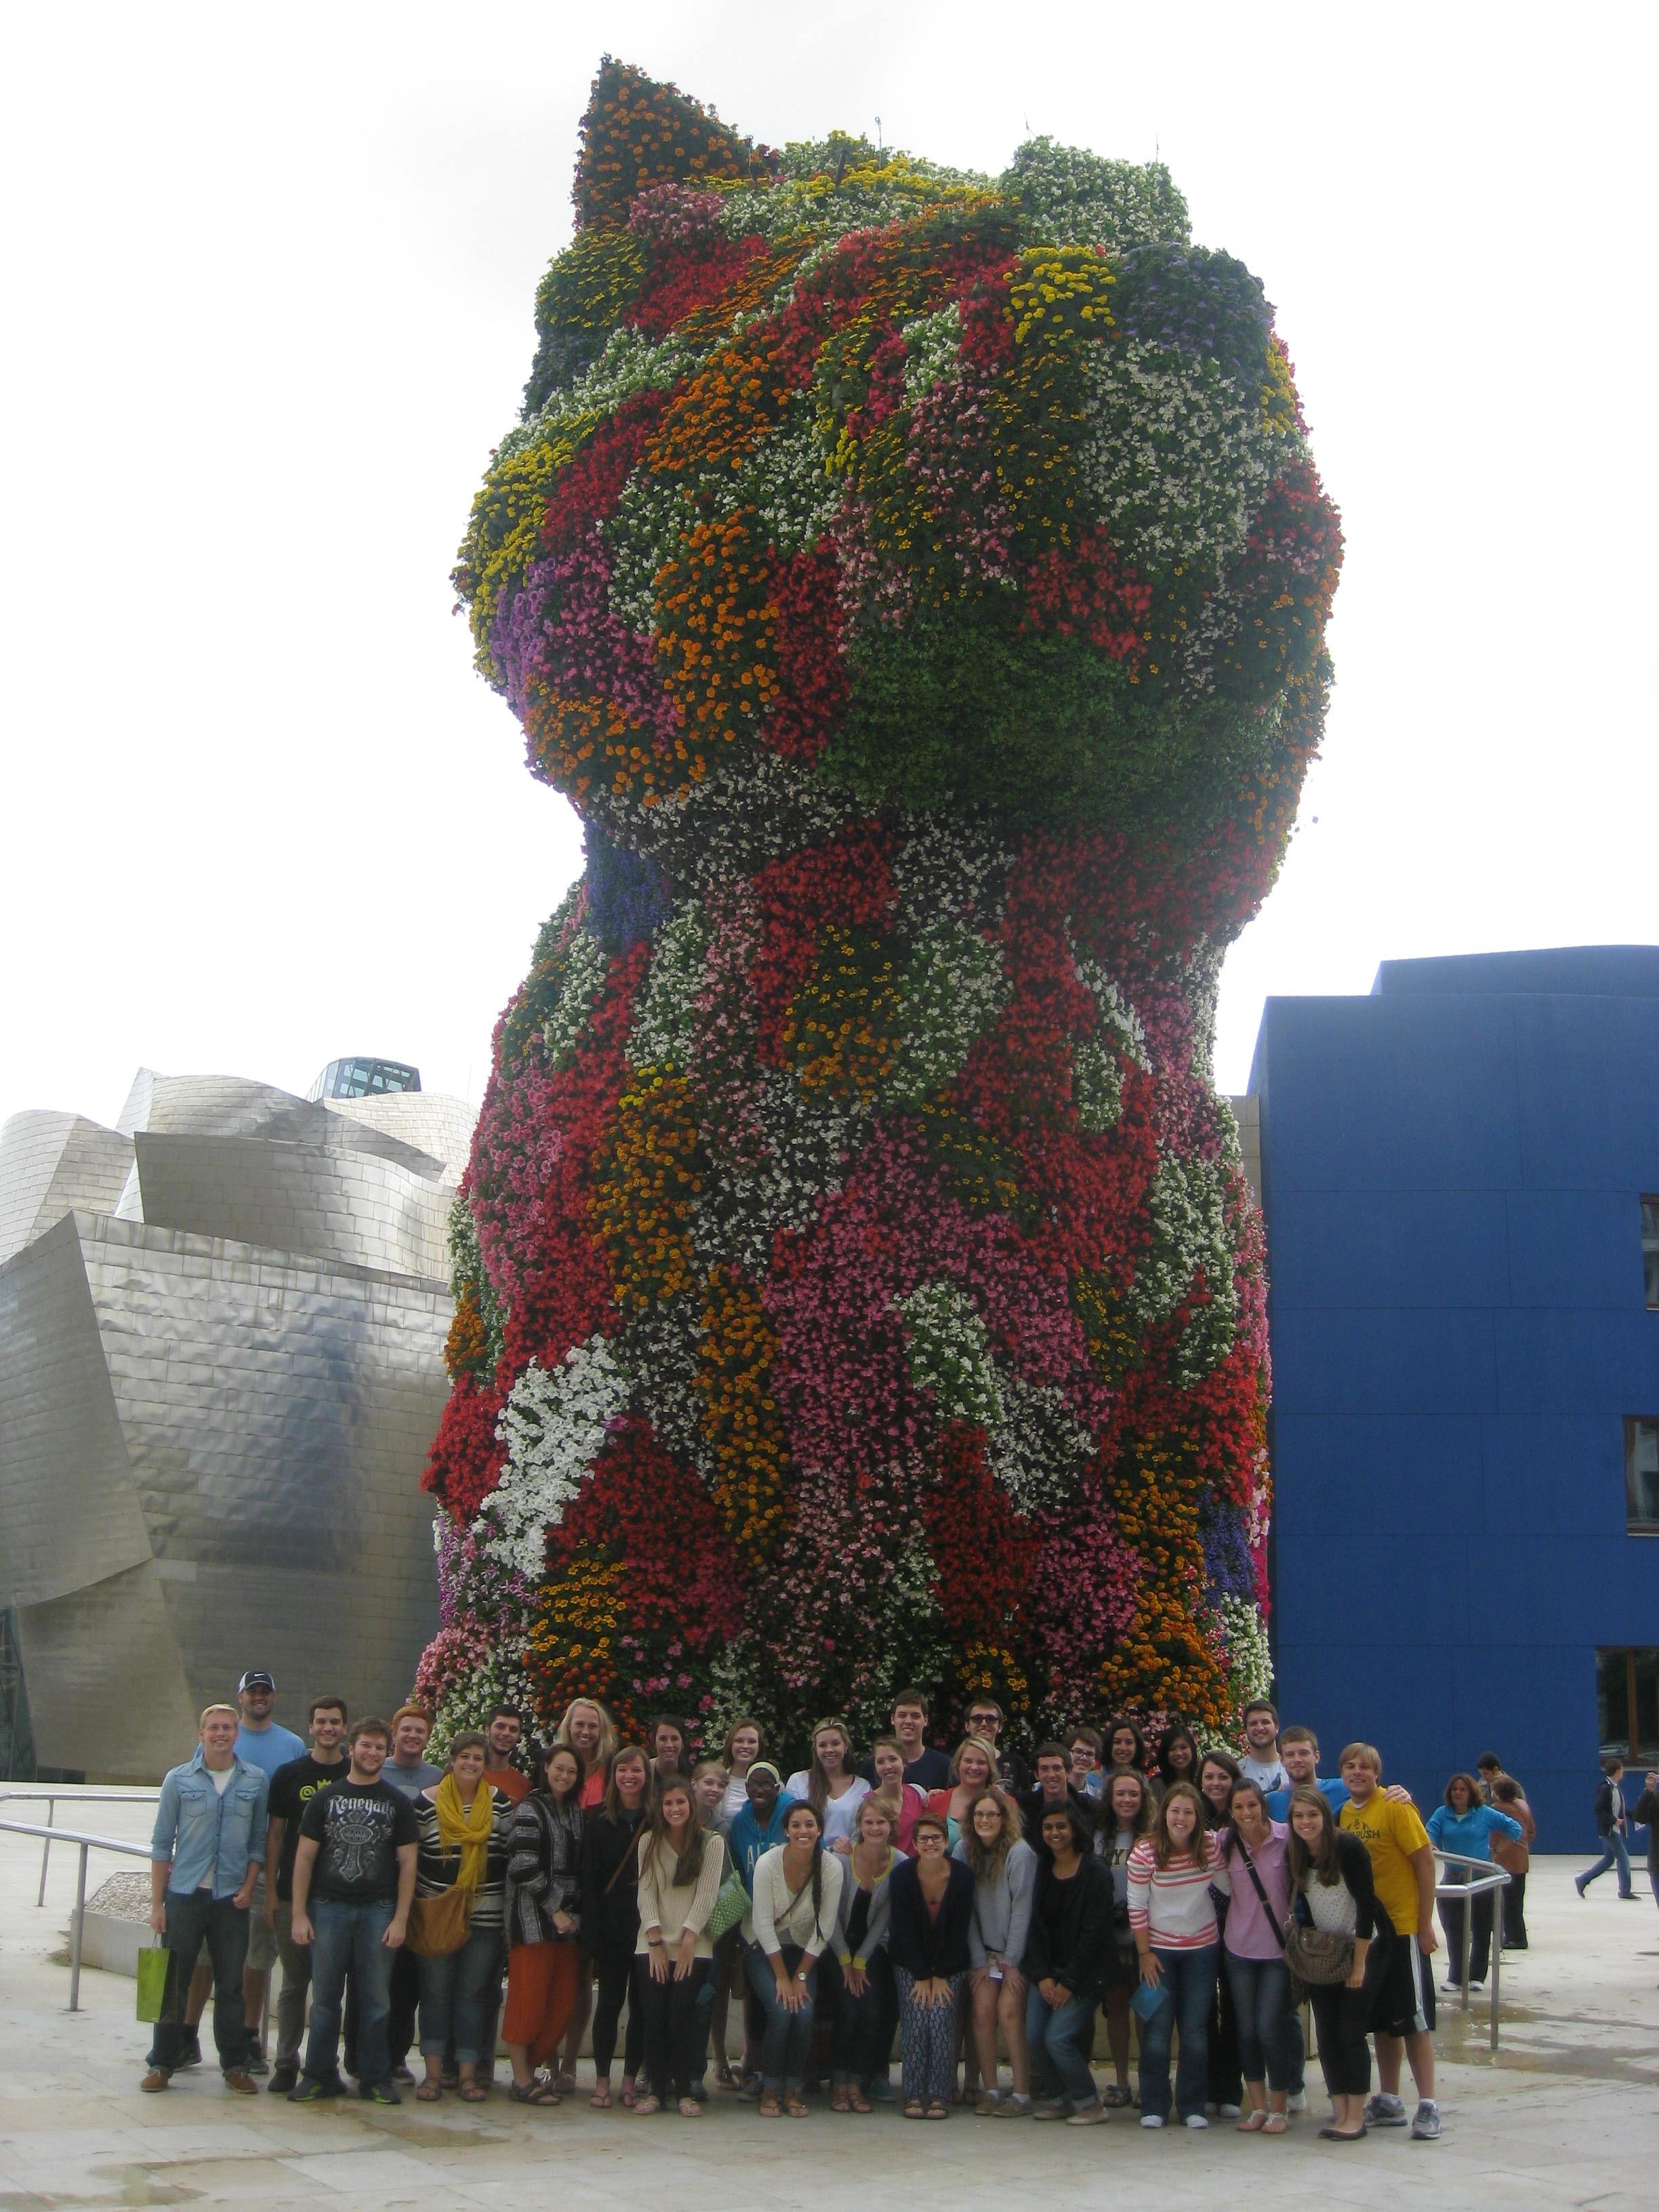 Spain 2013 group